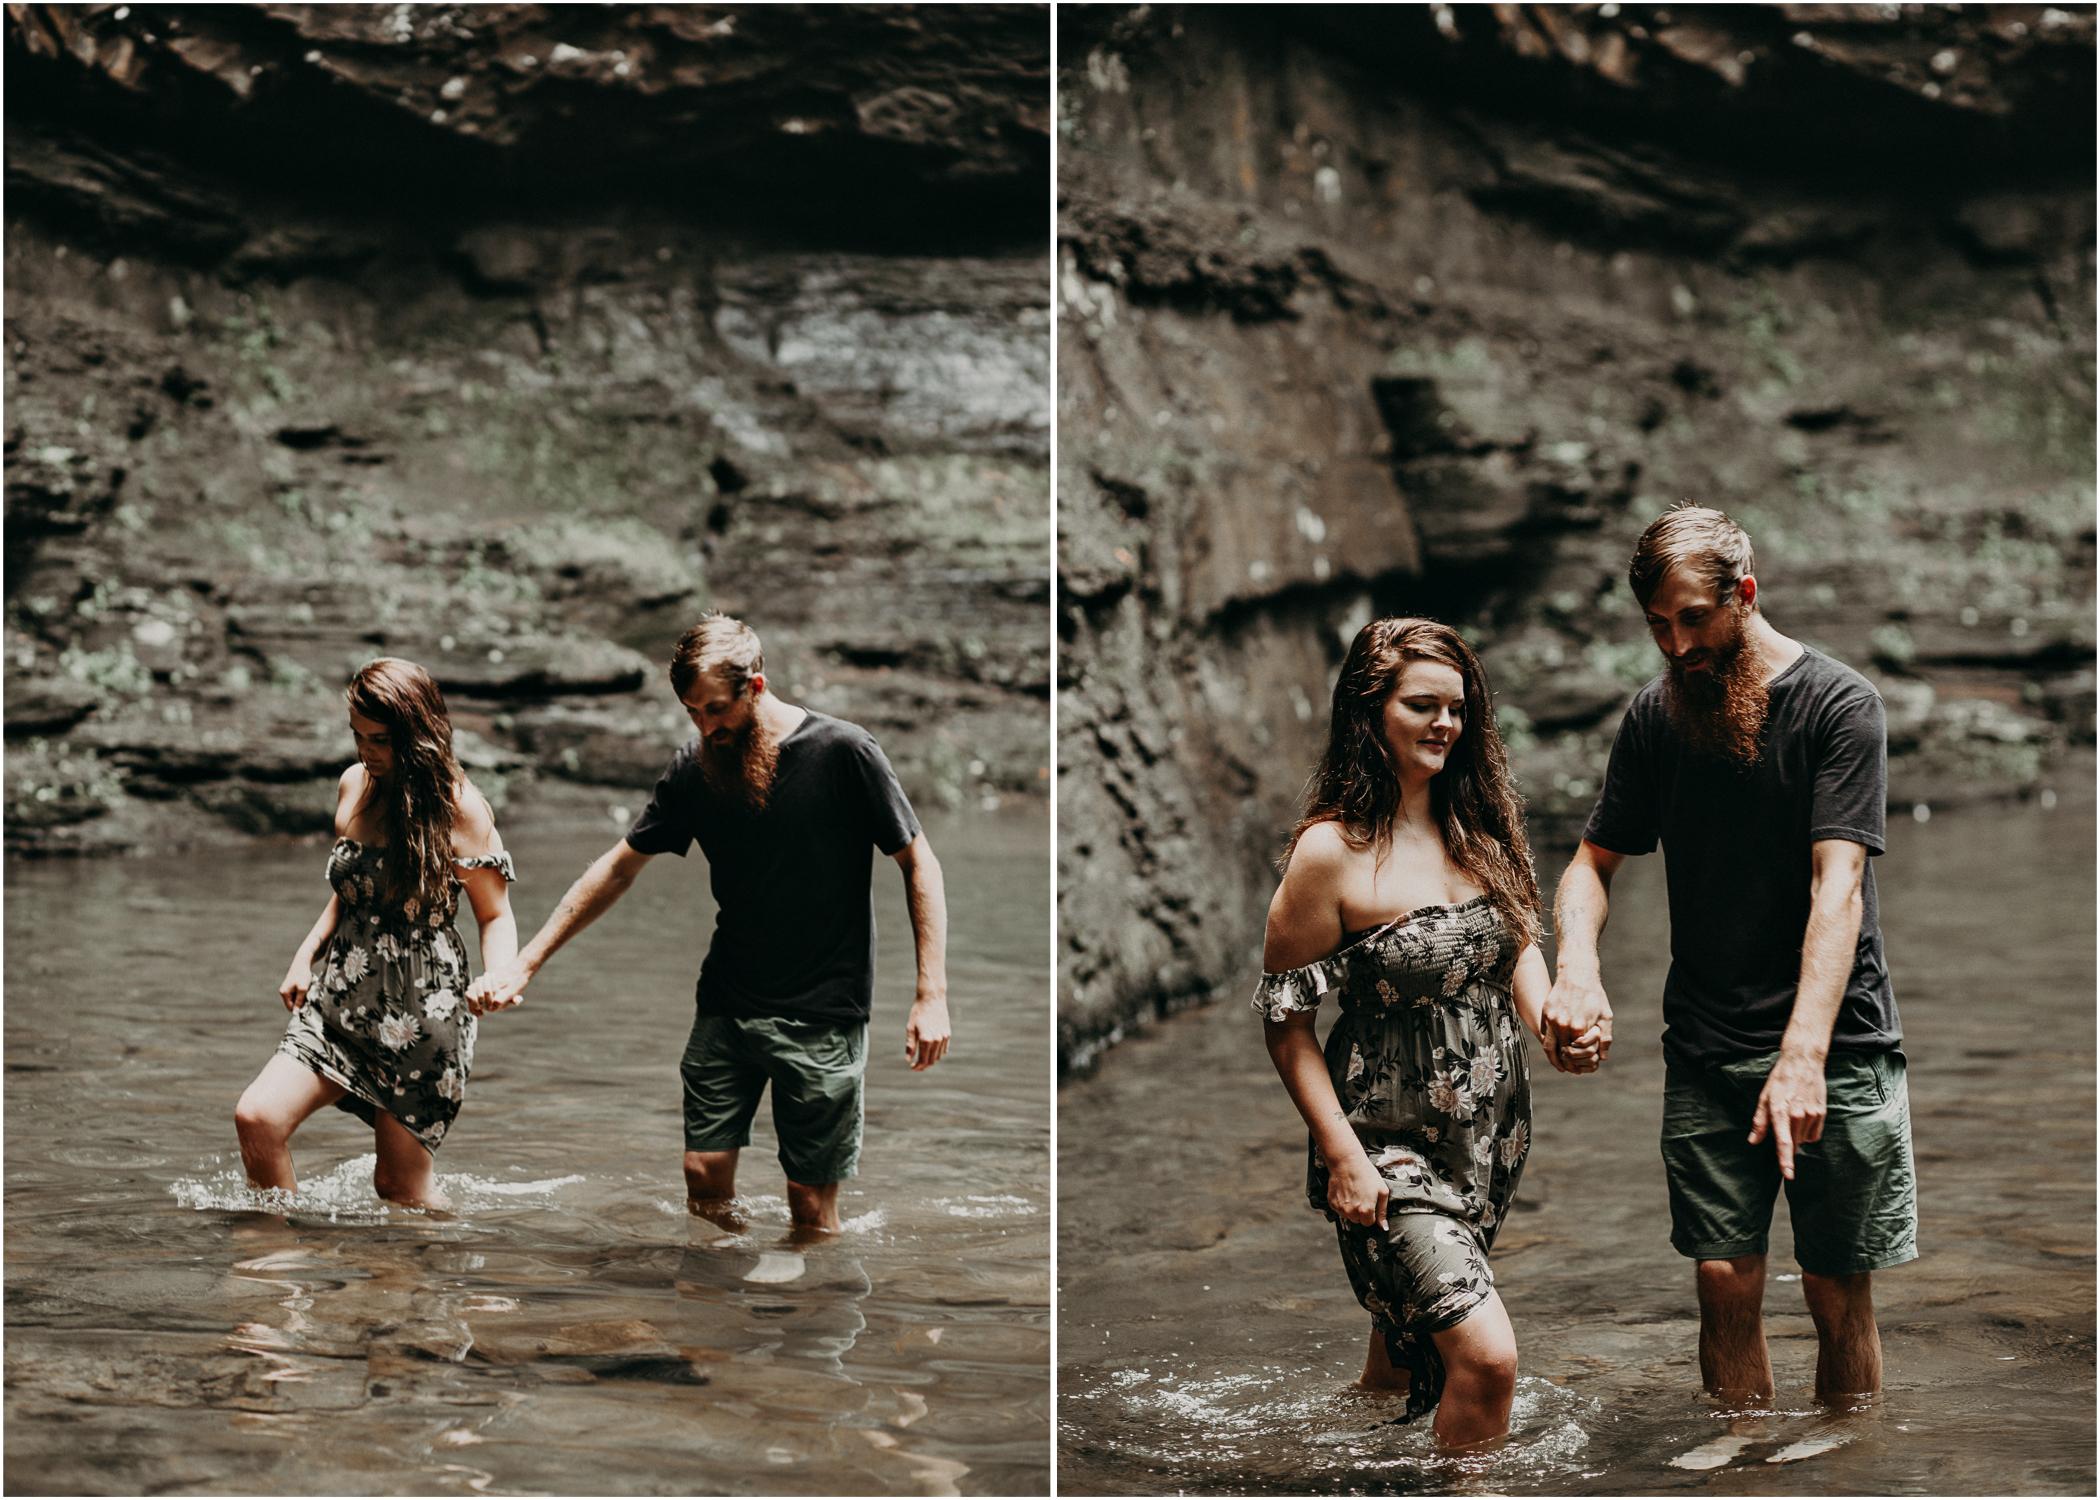 Cloudland canyon, whaterfall georgia, couples waterfall engagement 25.jpg